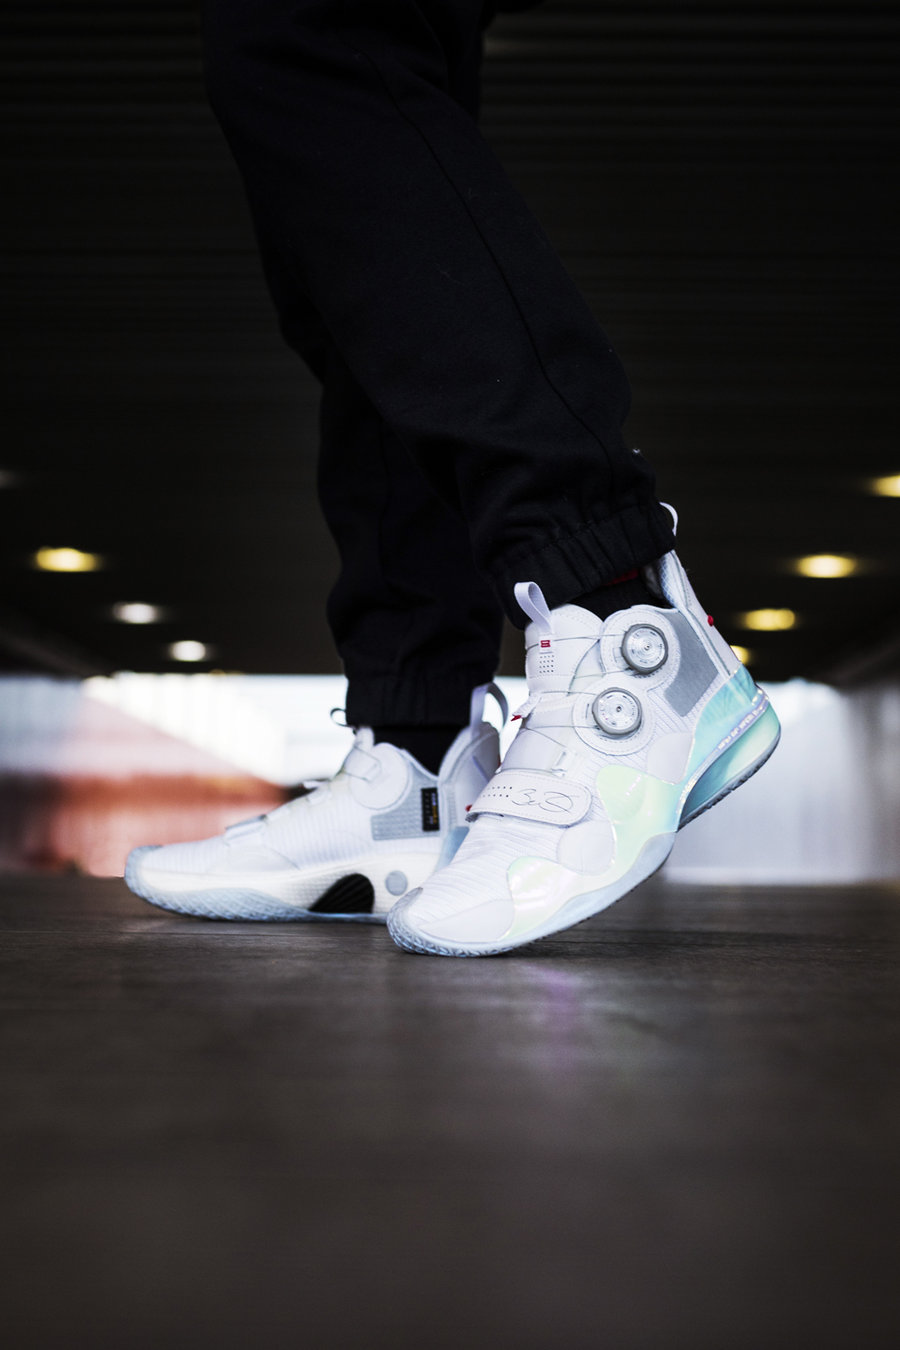 Dunk SB,Nike,AJ6,Air Jordan 6, RayGun 超火!今年最后一个球鞋发售周末,你抢到了哪双?